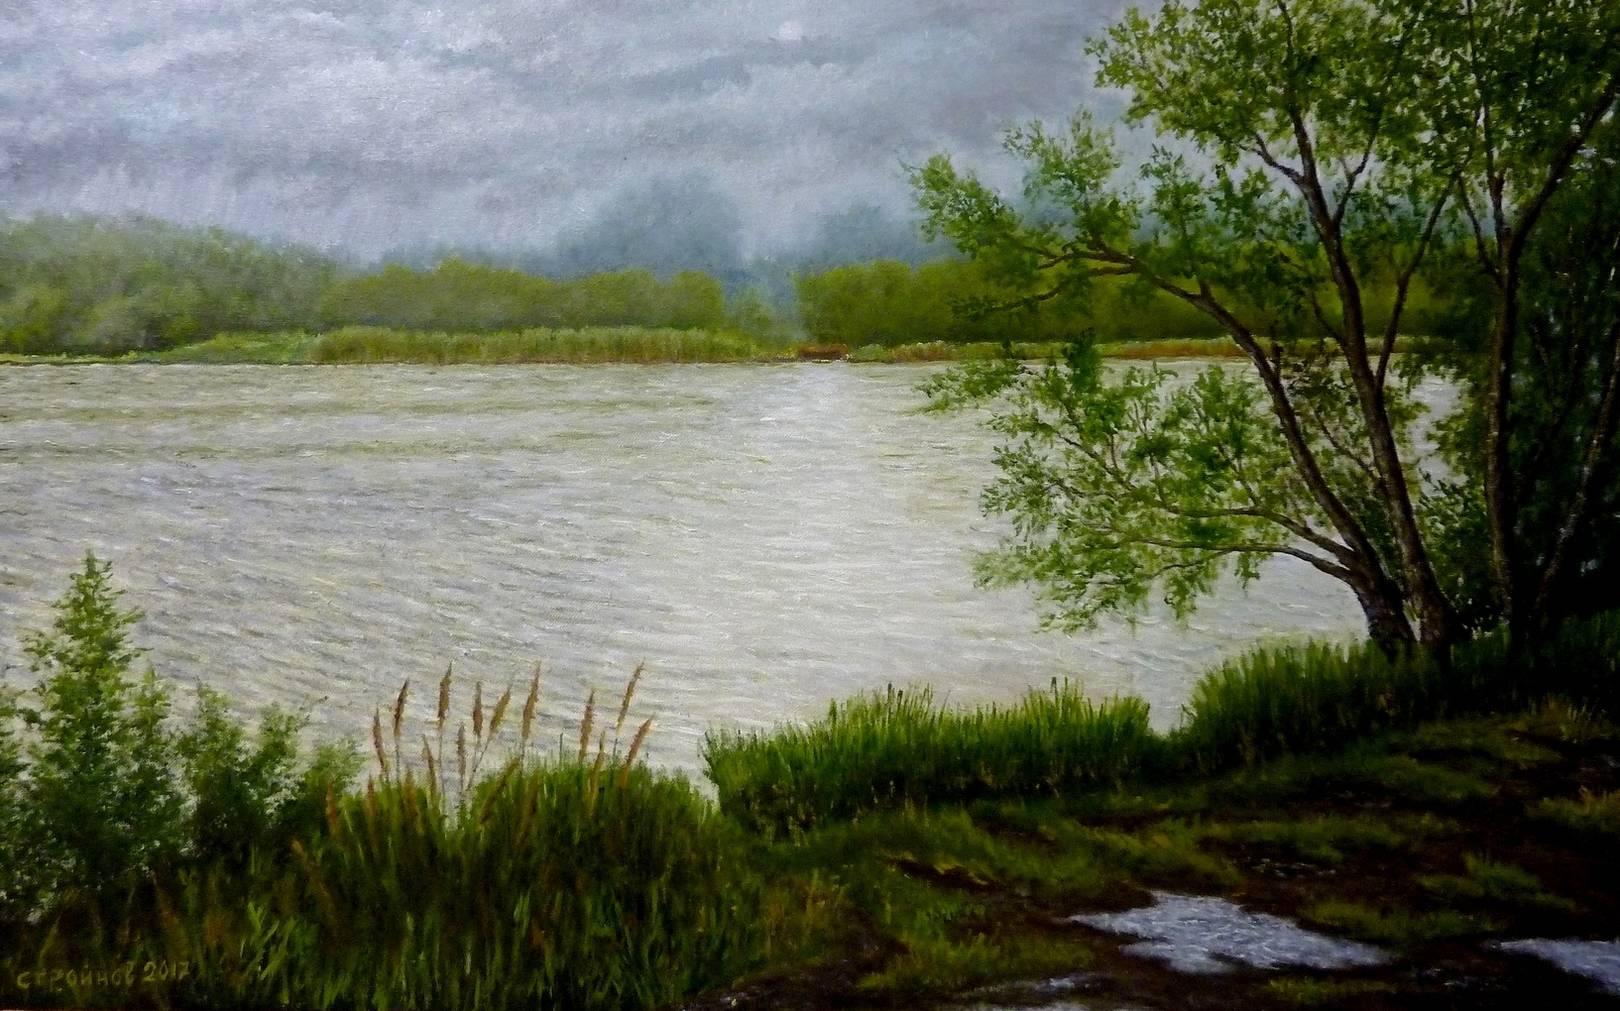 Река Сура. Дождь.  холст, масло 50х80 см.